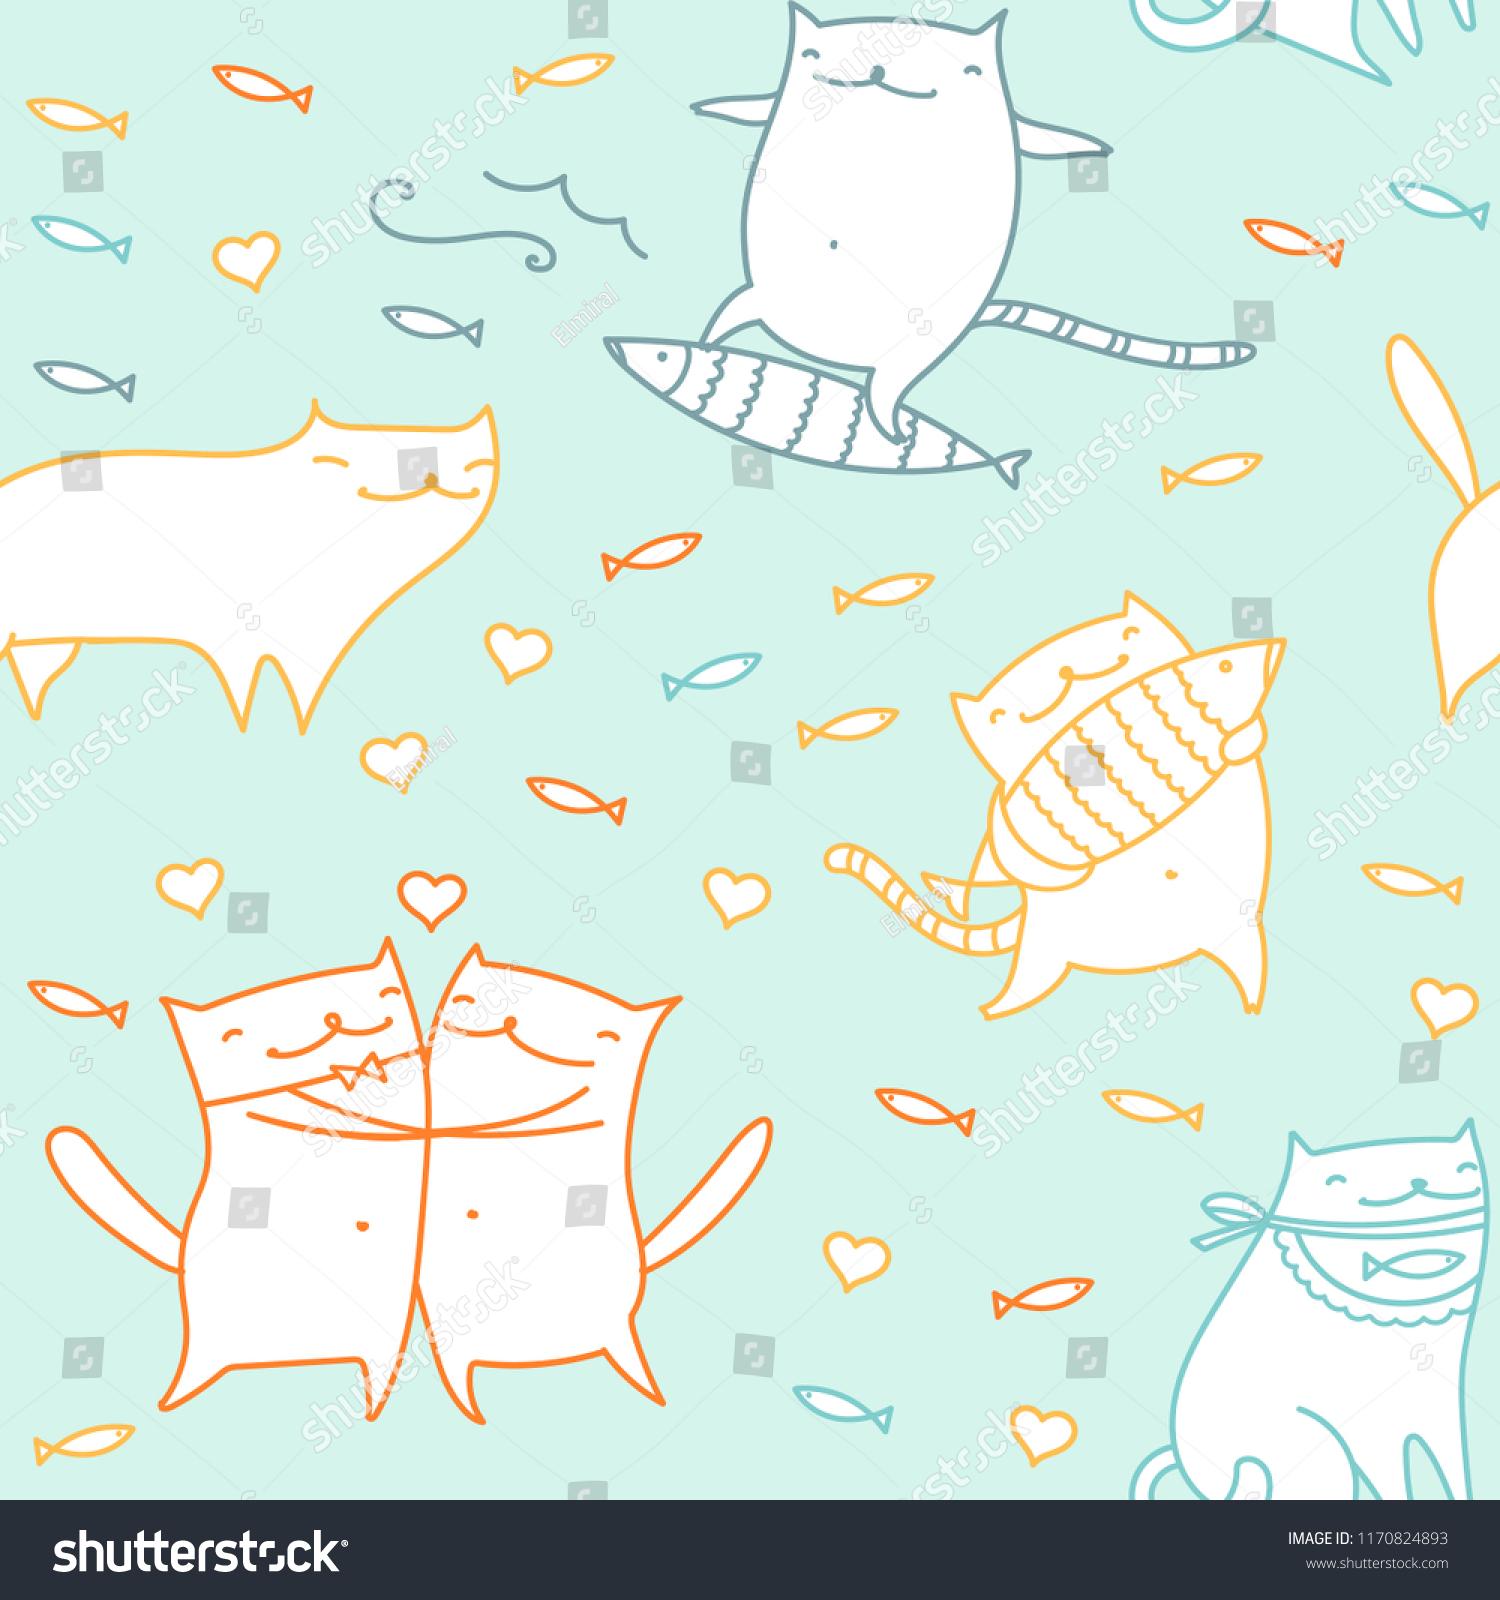 Cute Animal Text Symbols Topsimages